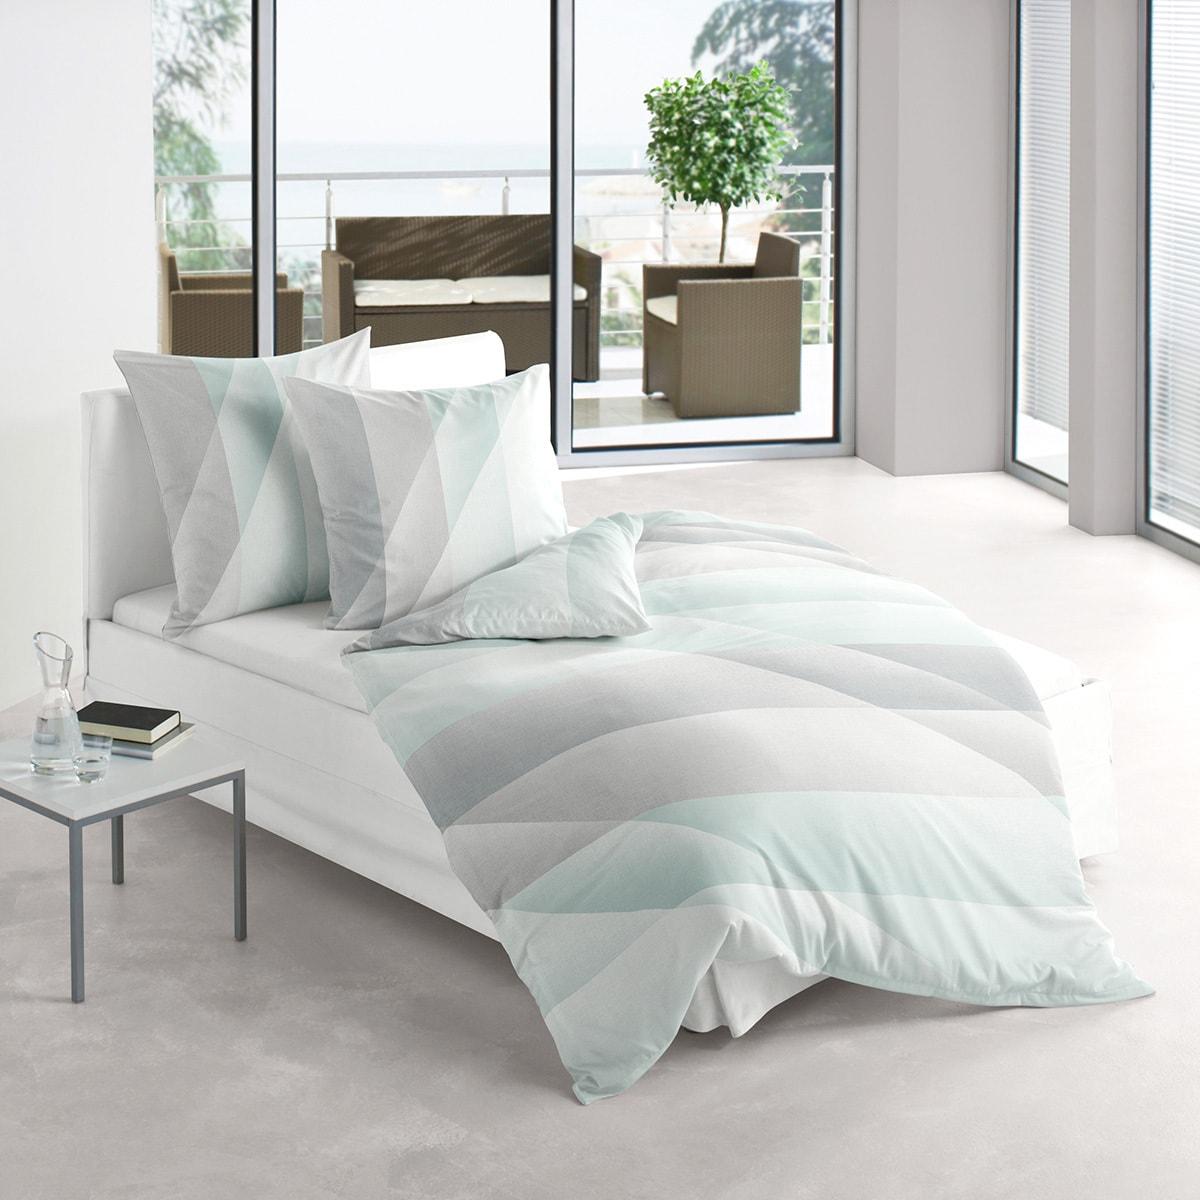 irisette mako satin bettw sche capri 8683 30 g nstig. Black Bedroom Furniture Sets. Home Design Ideas